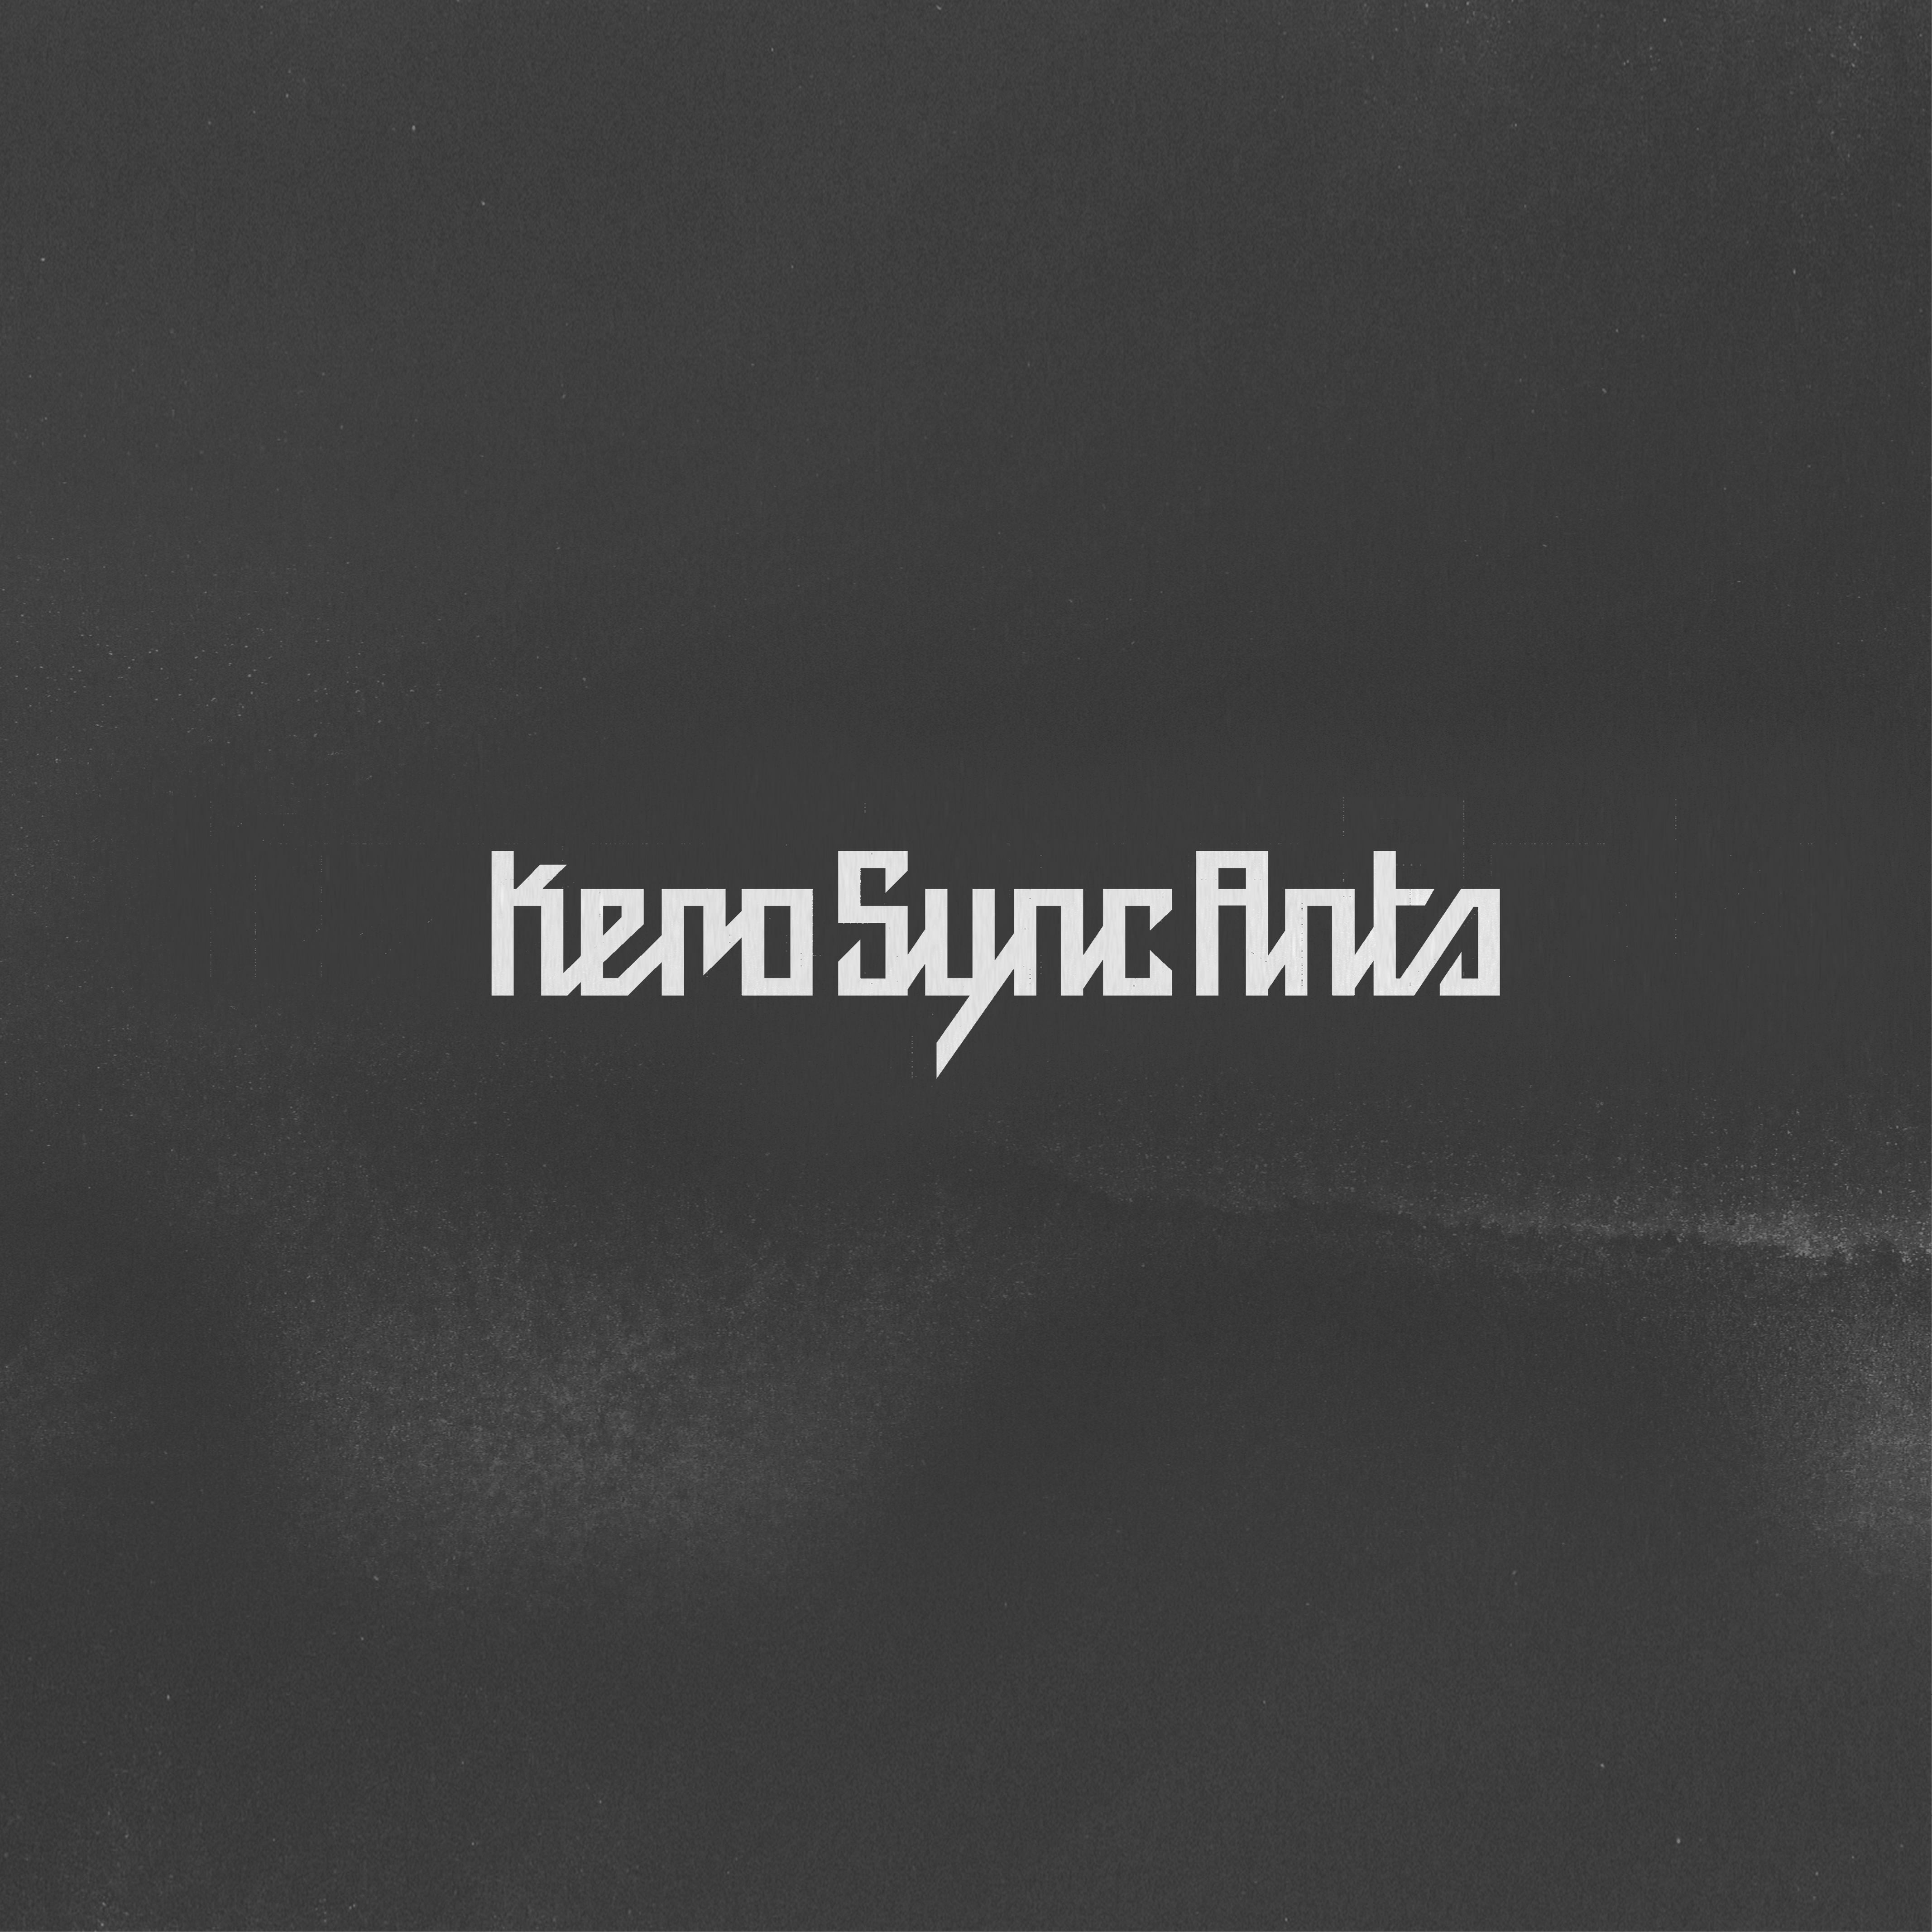 Kerosyncants Logo 00 MHG Bern